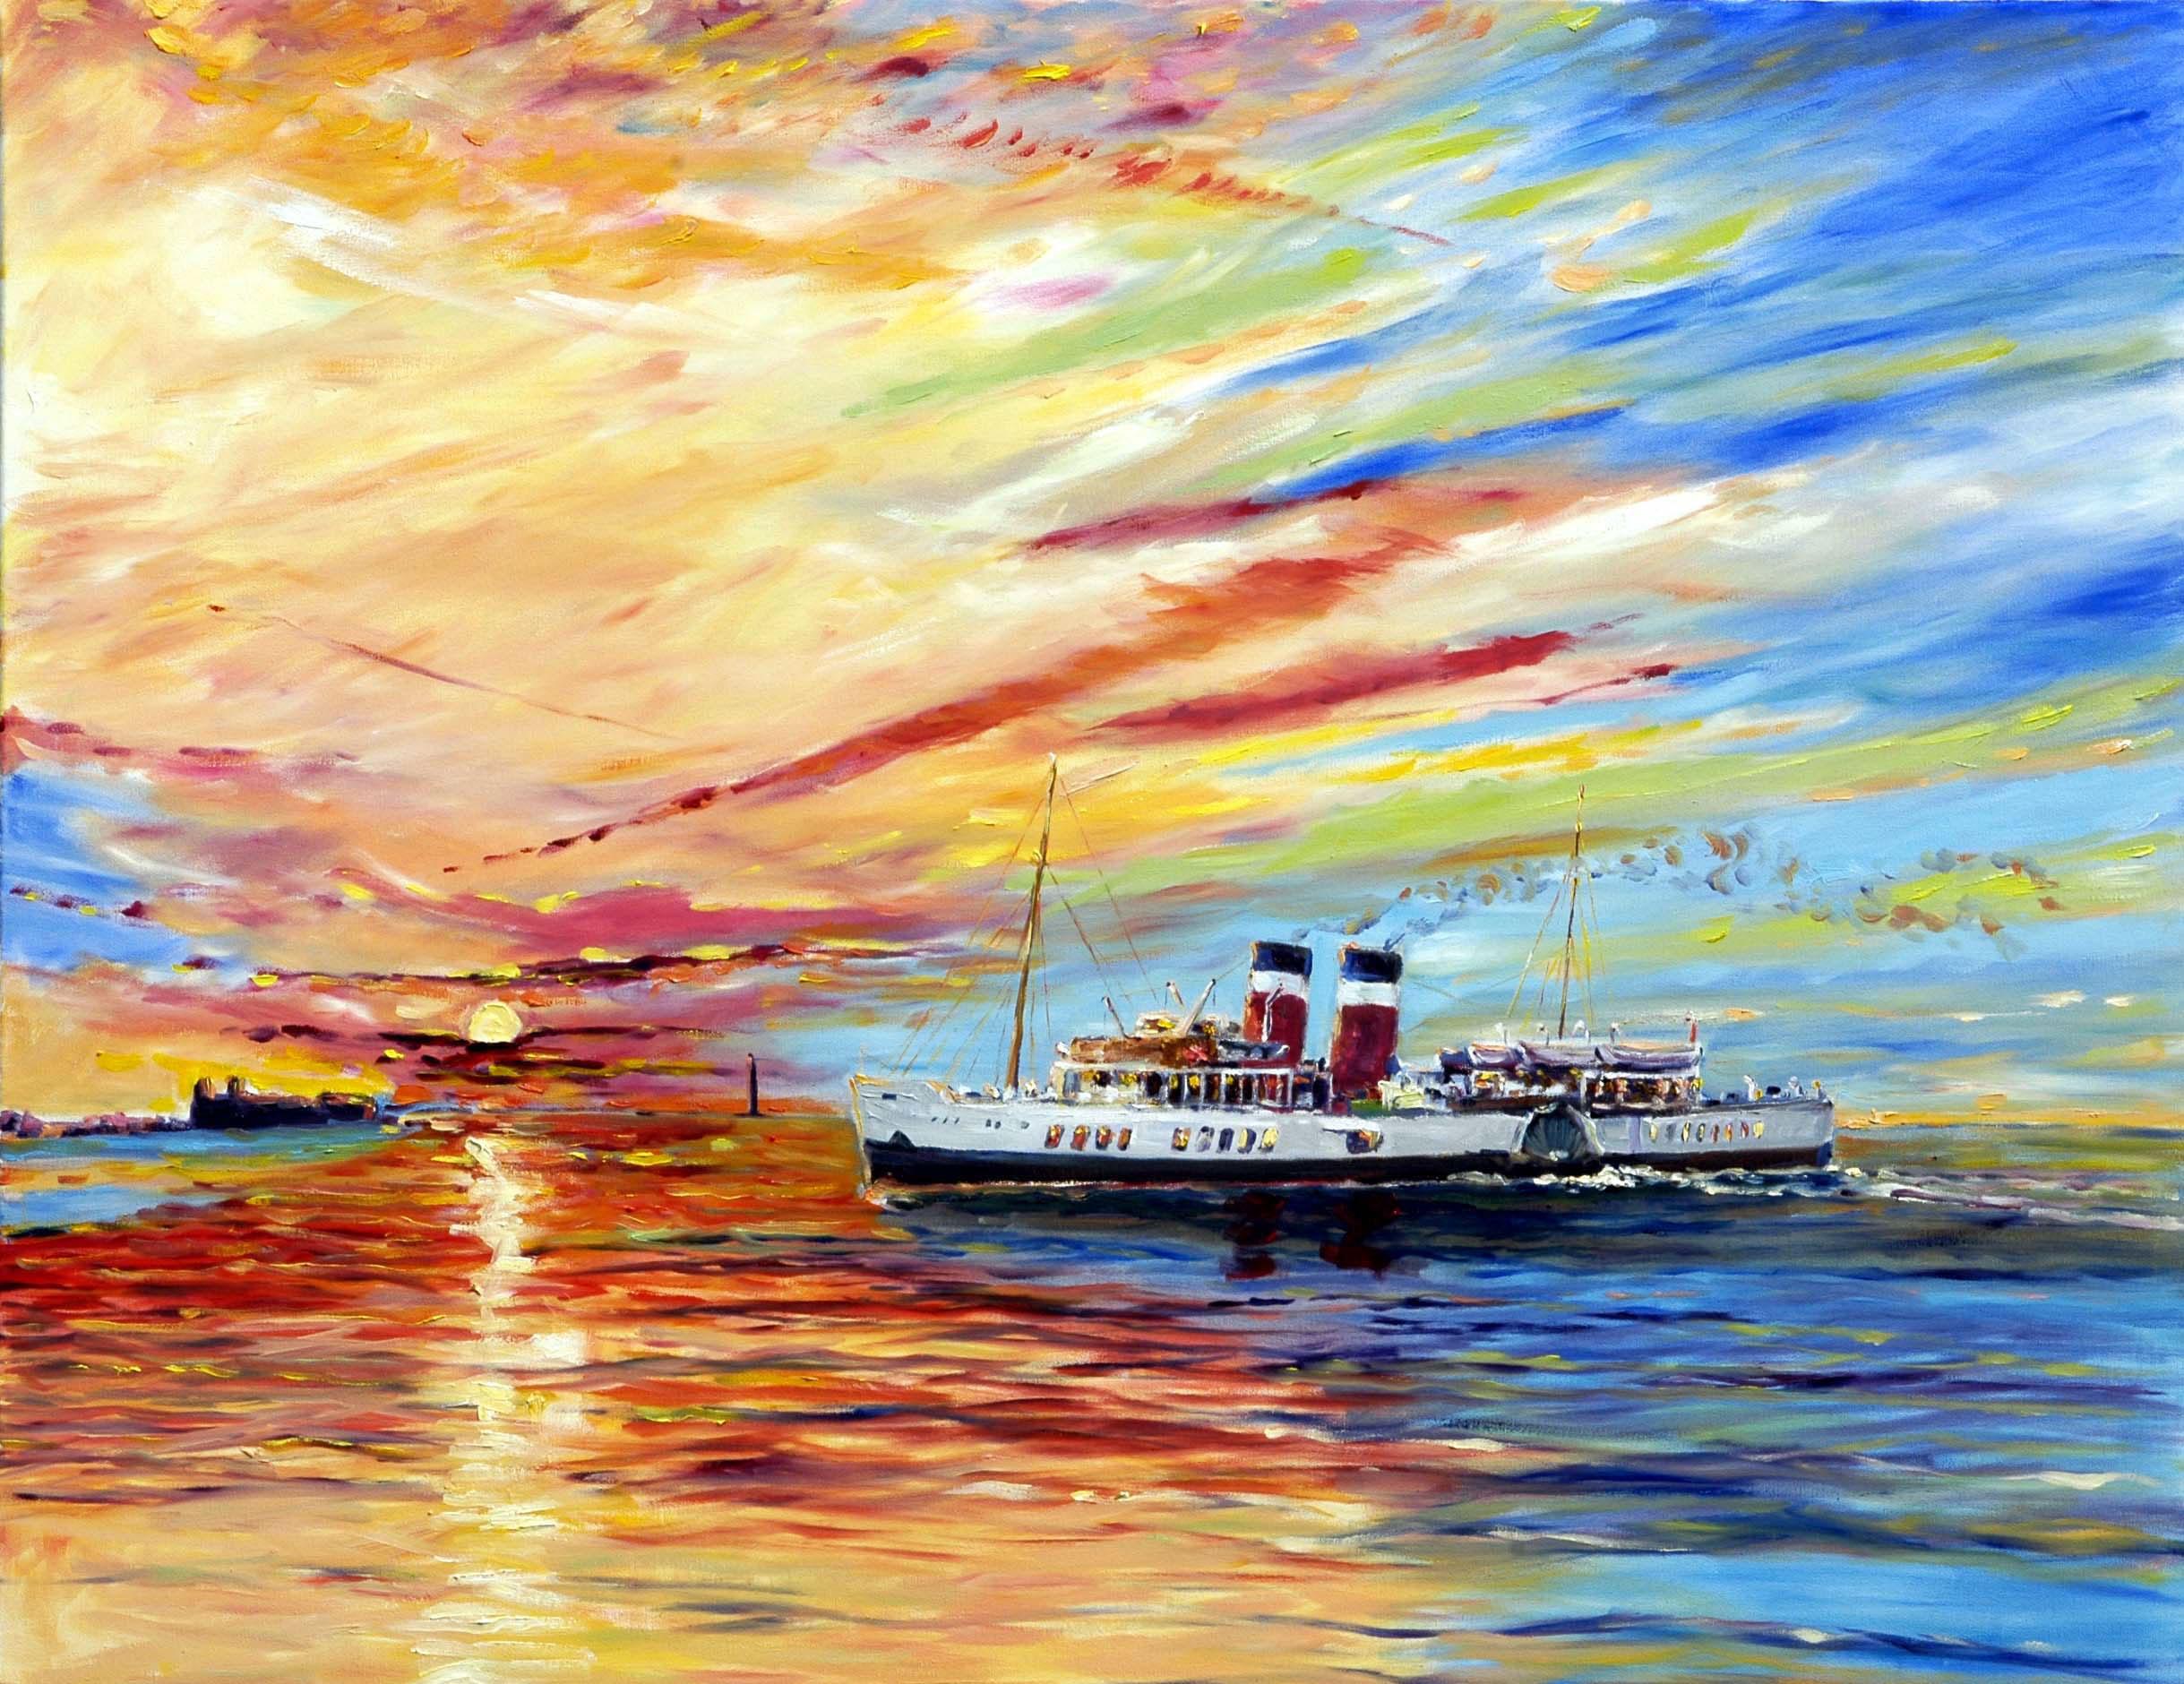 art classes, merseyside, southport, ss waverley entering river mersey, liverpool